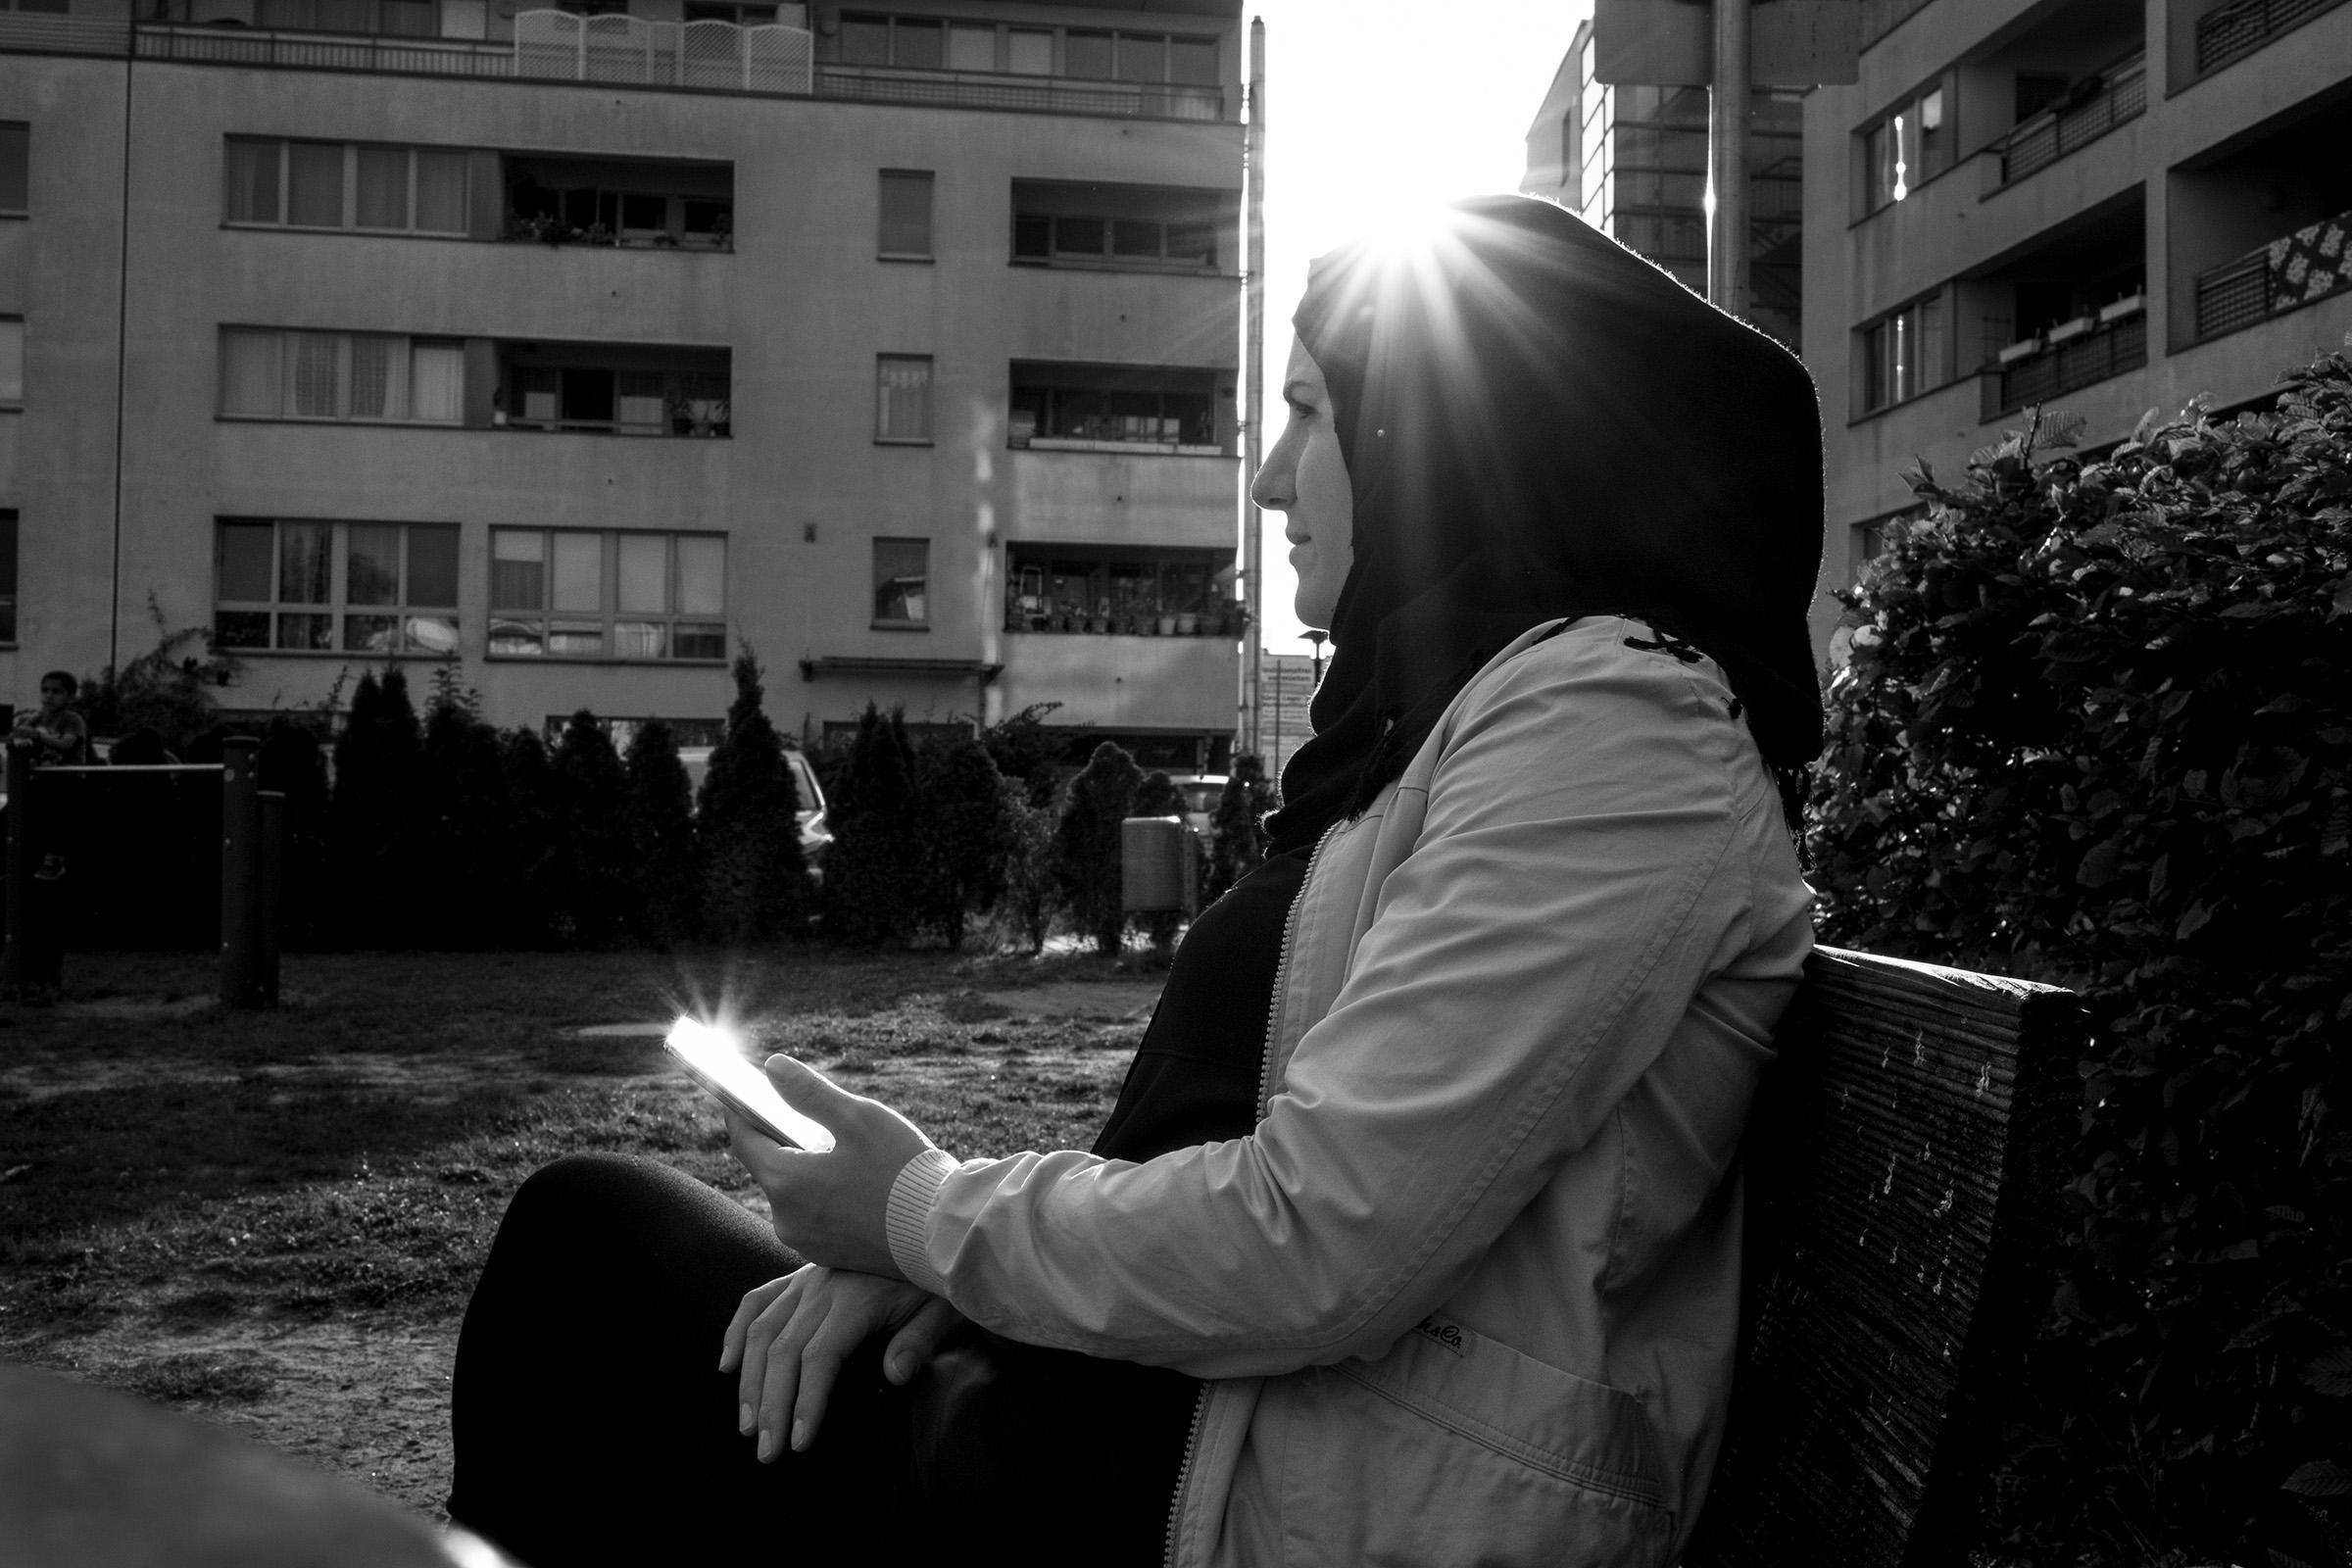 fluechtlinge-syrien-berlin-asyl-integration-sonne